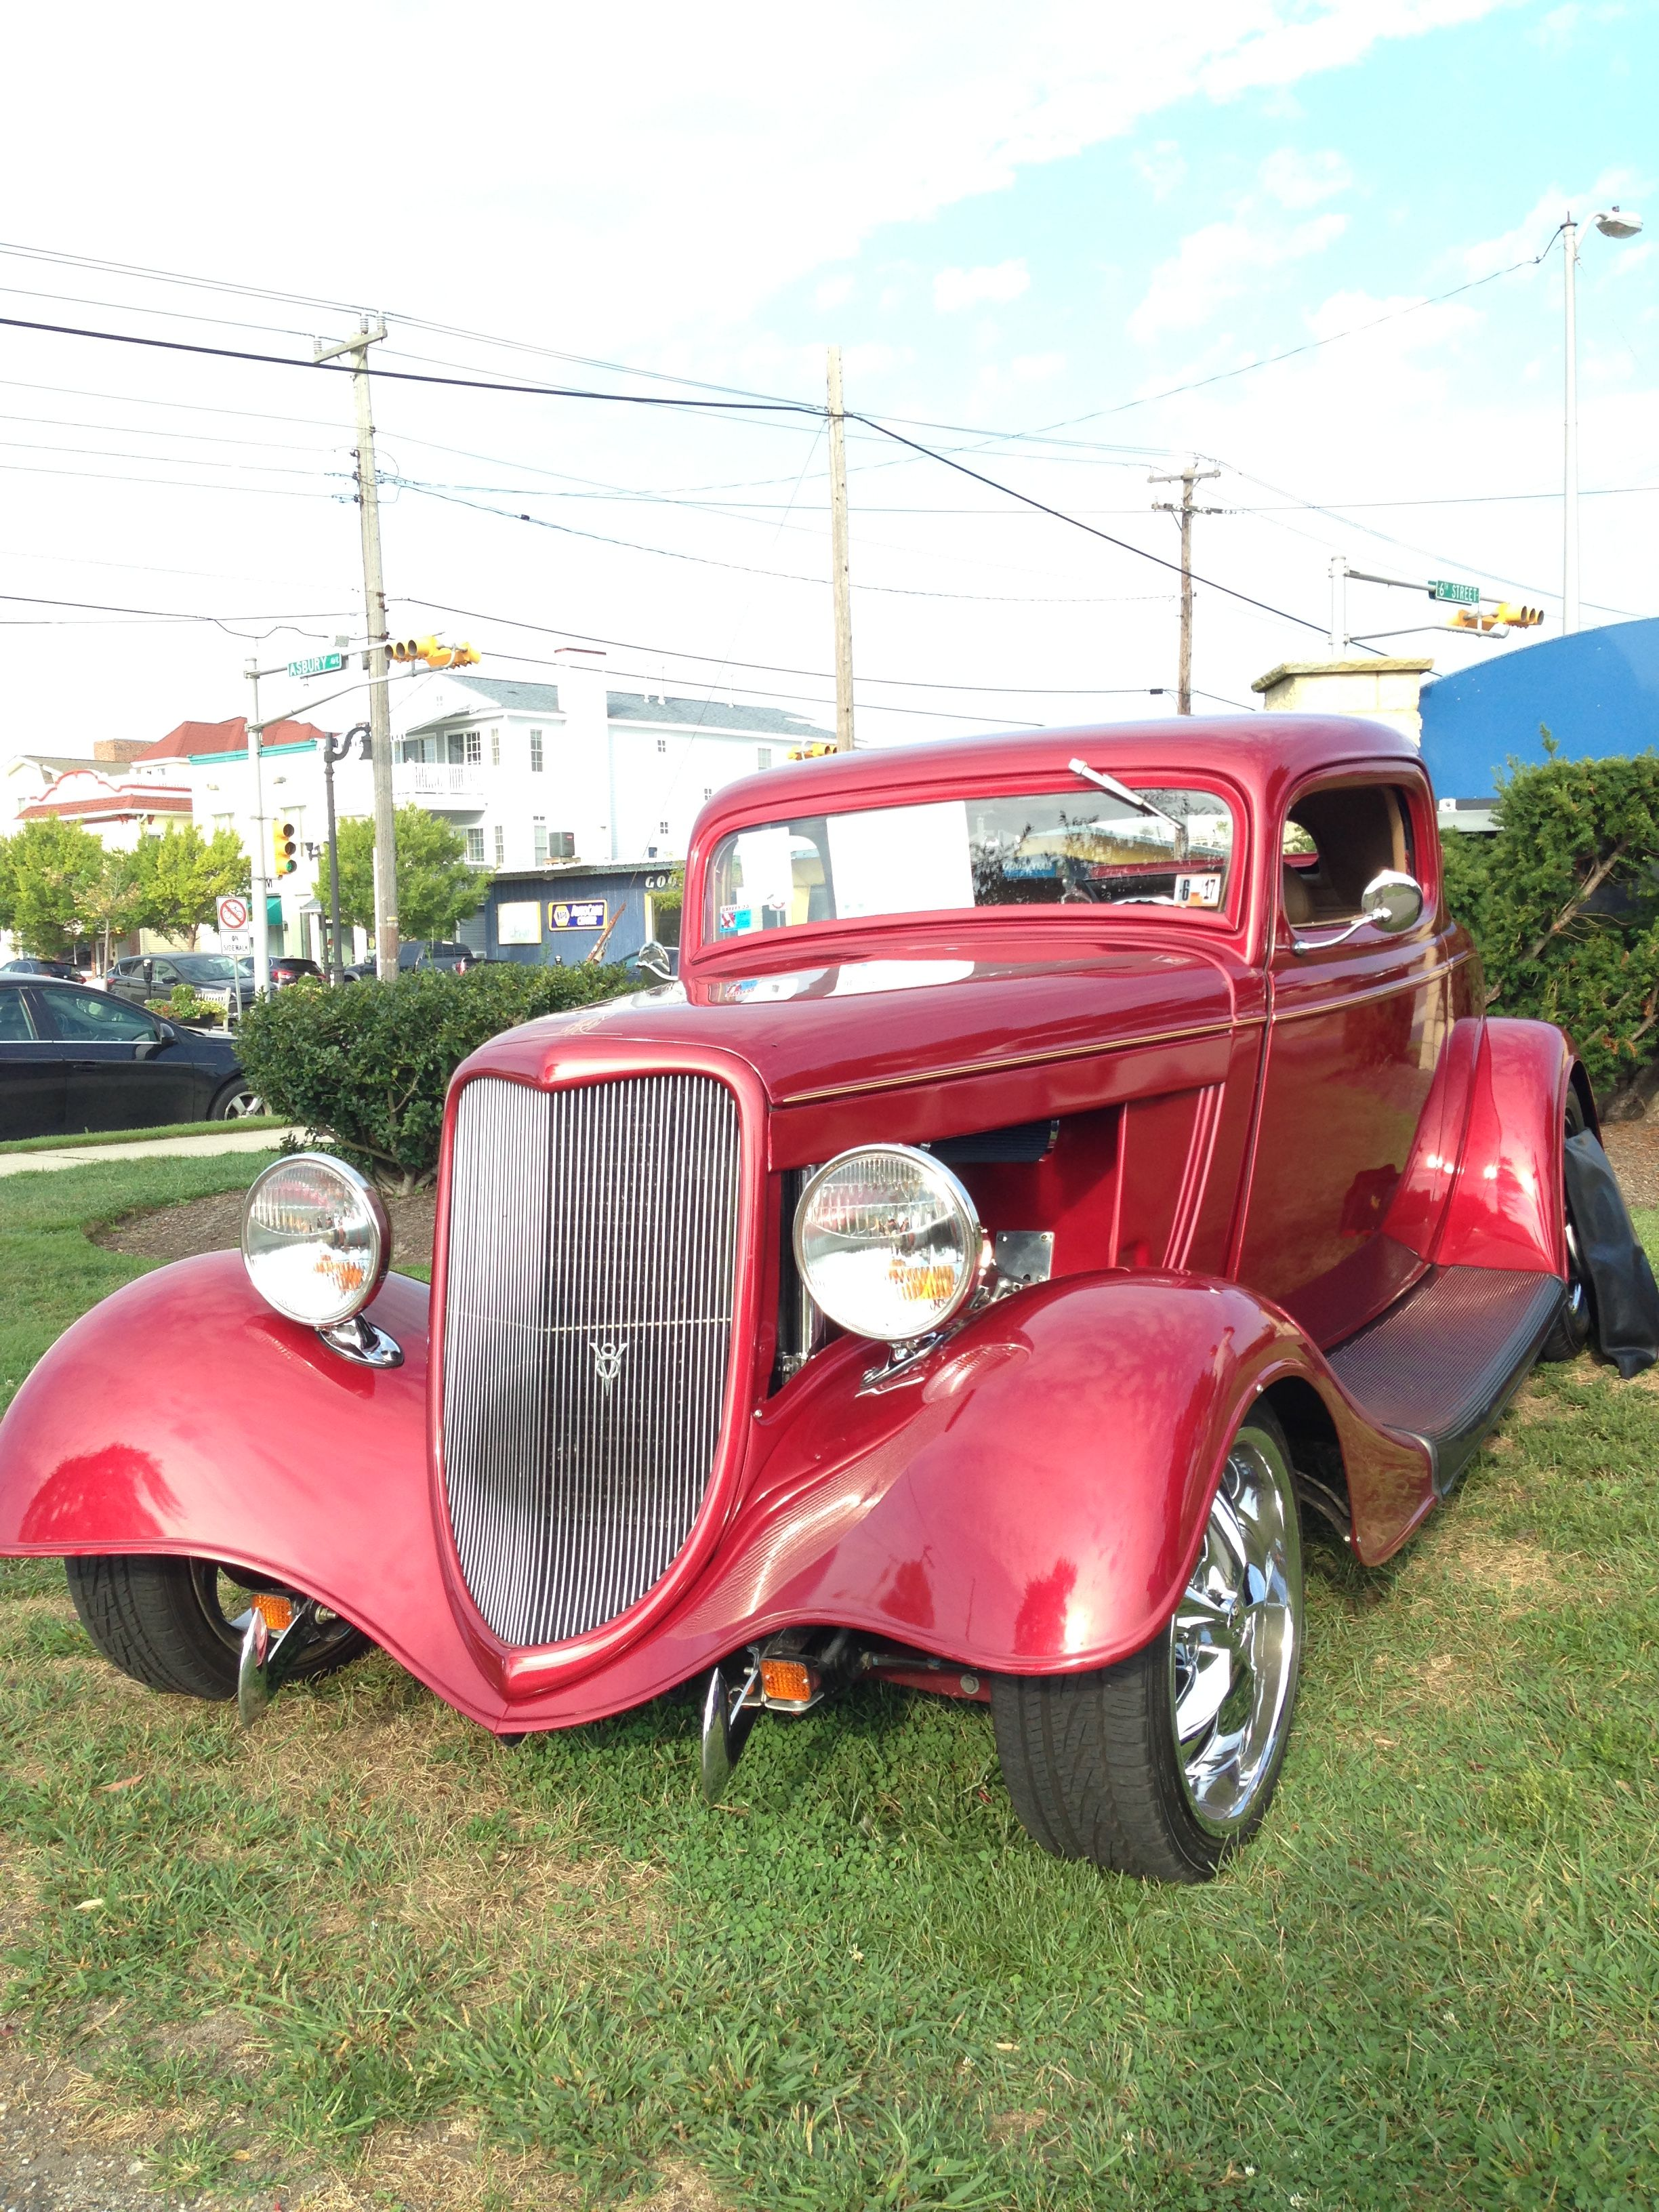 OC NJ Rod show Rat rod, Hot rods, Antique cars